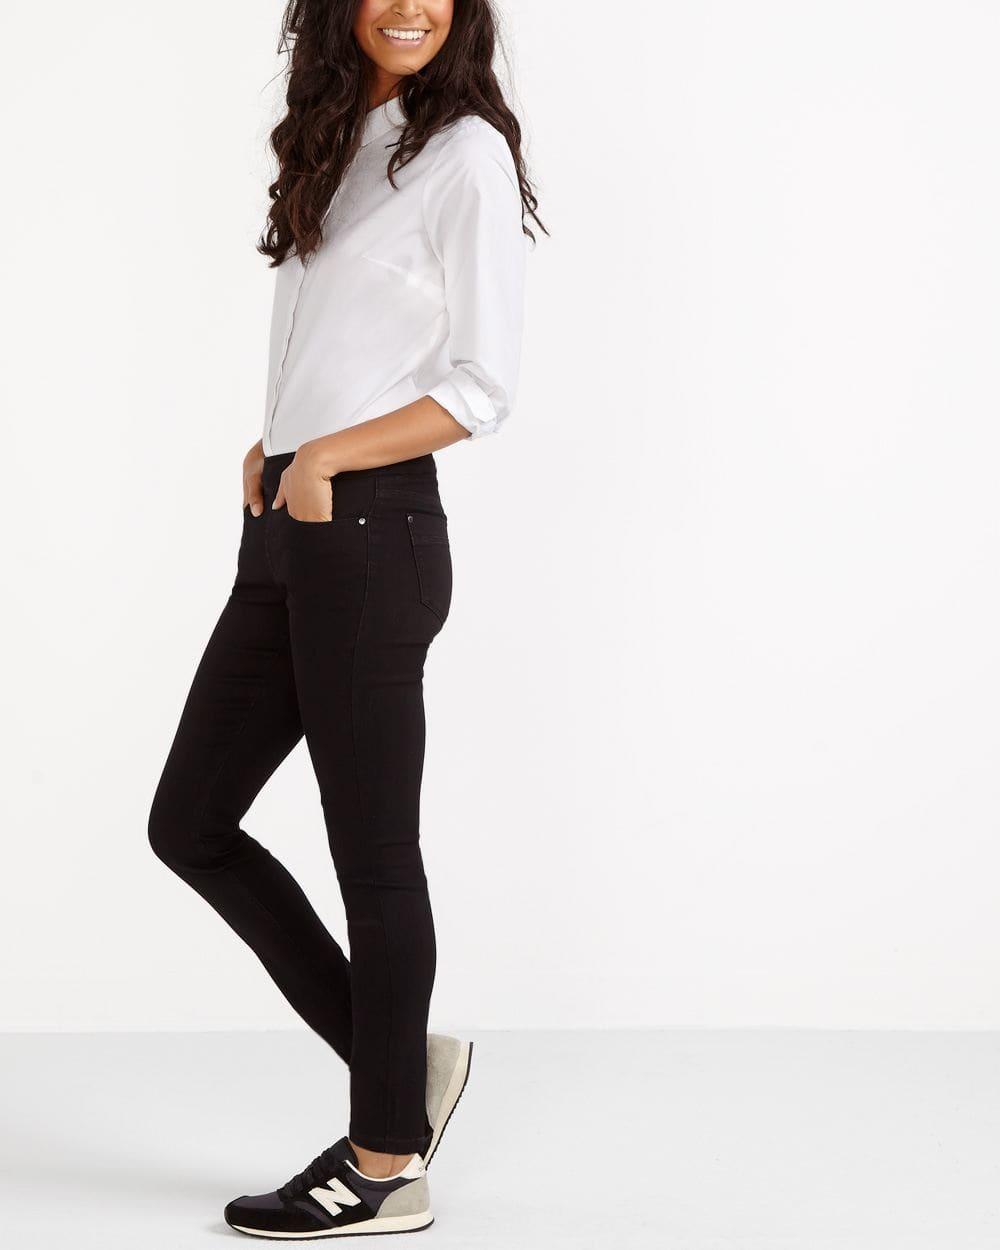 The Petite Original Comfort Jeans